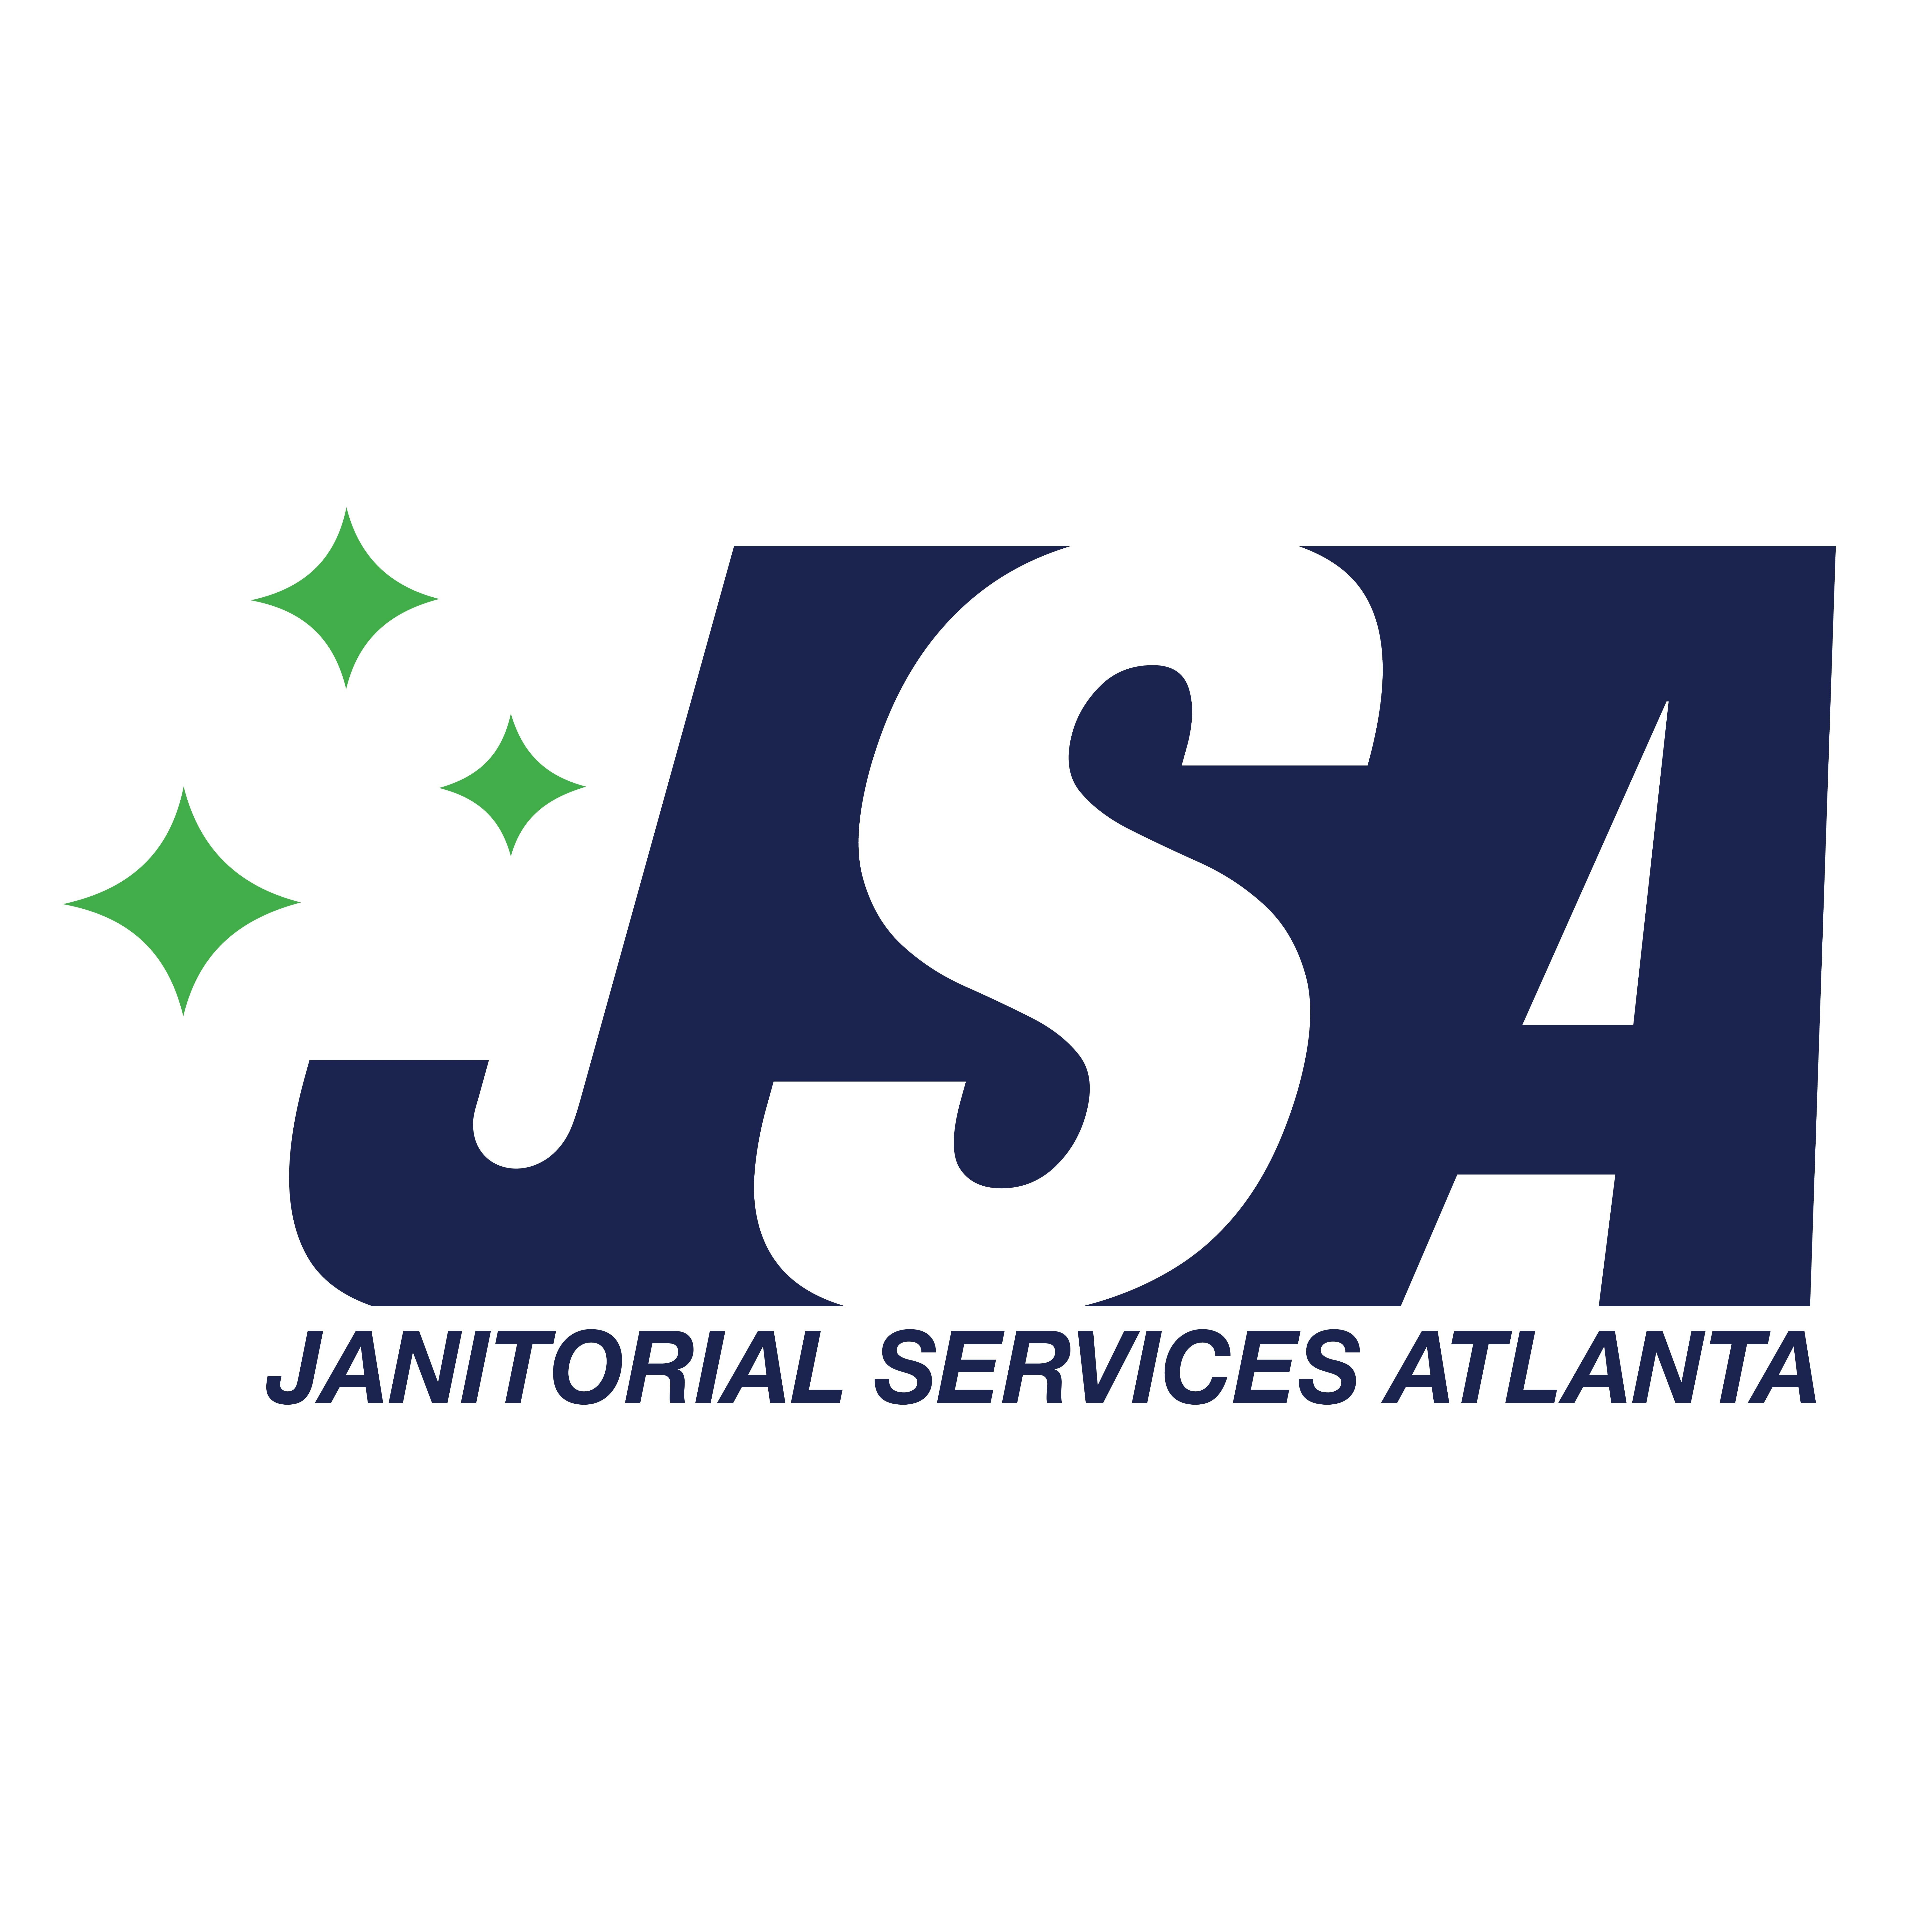 Janitorial Services Atlanta